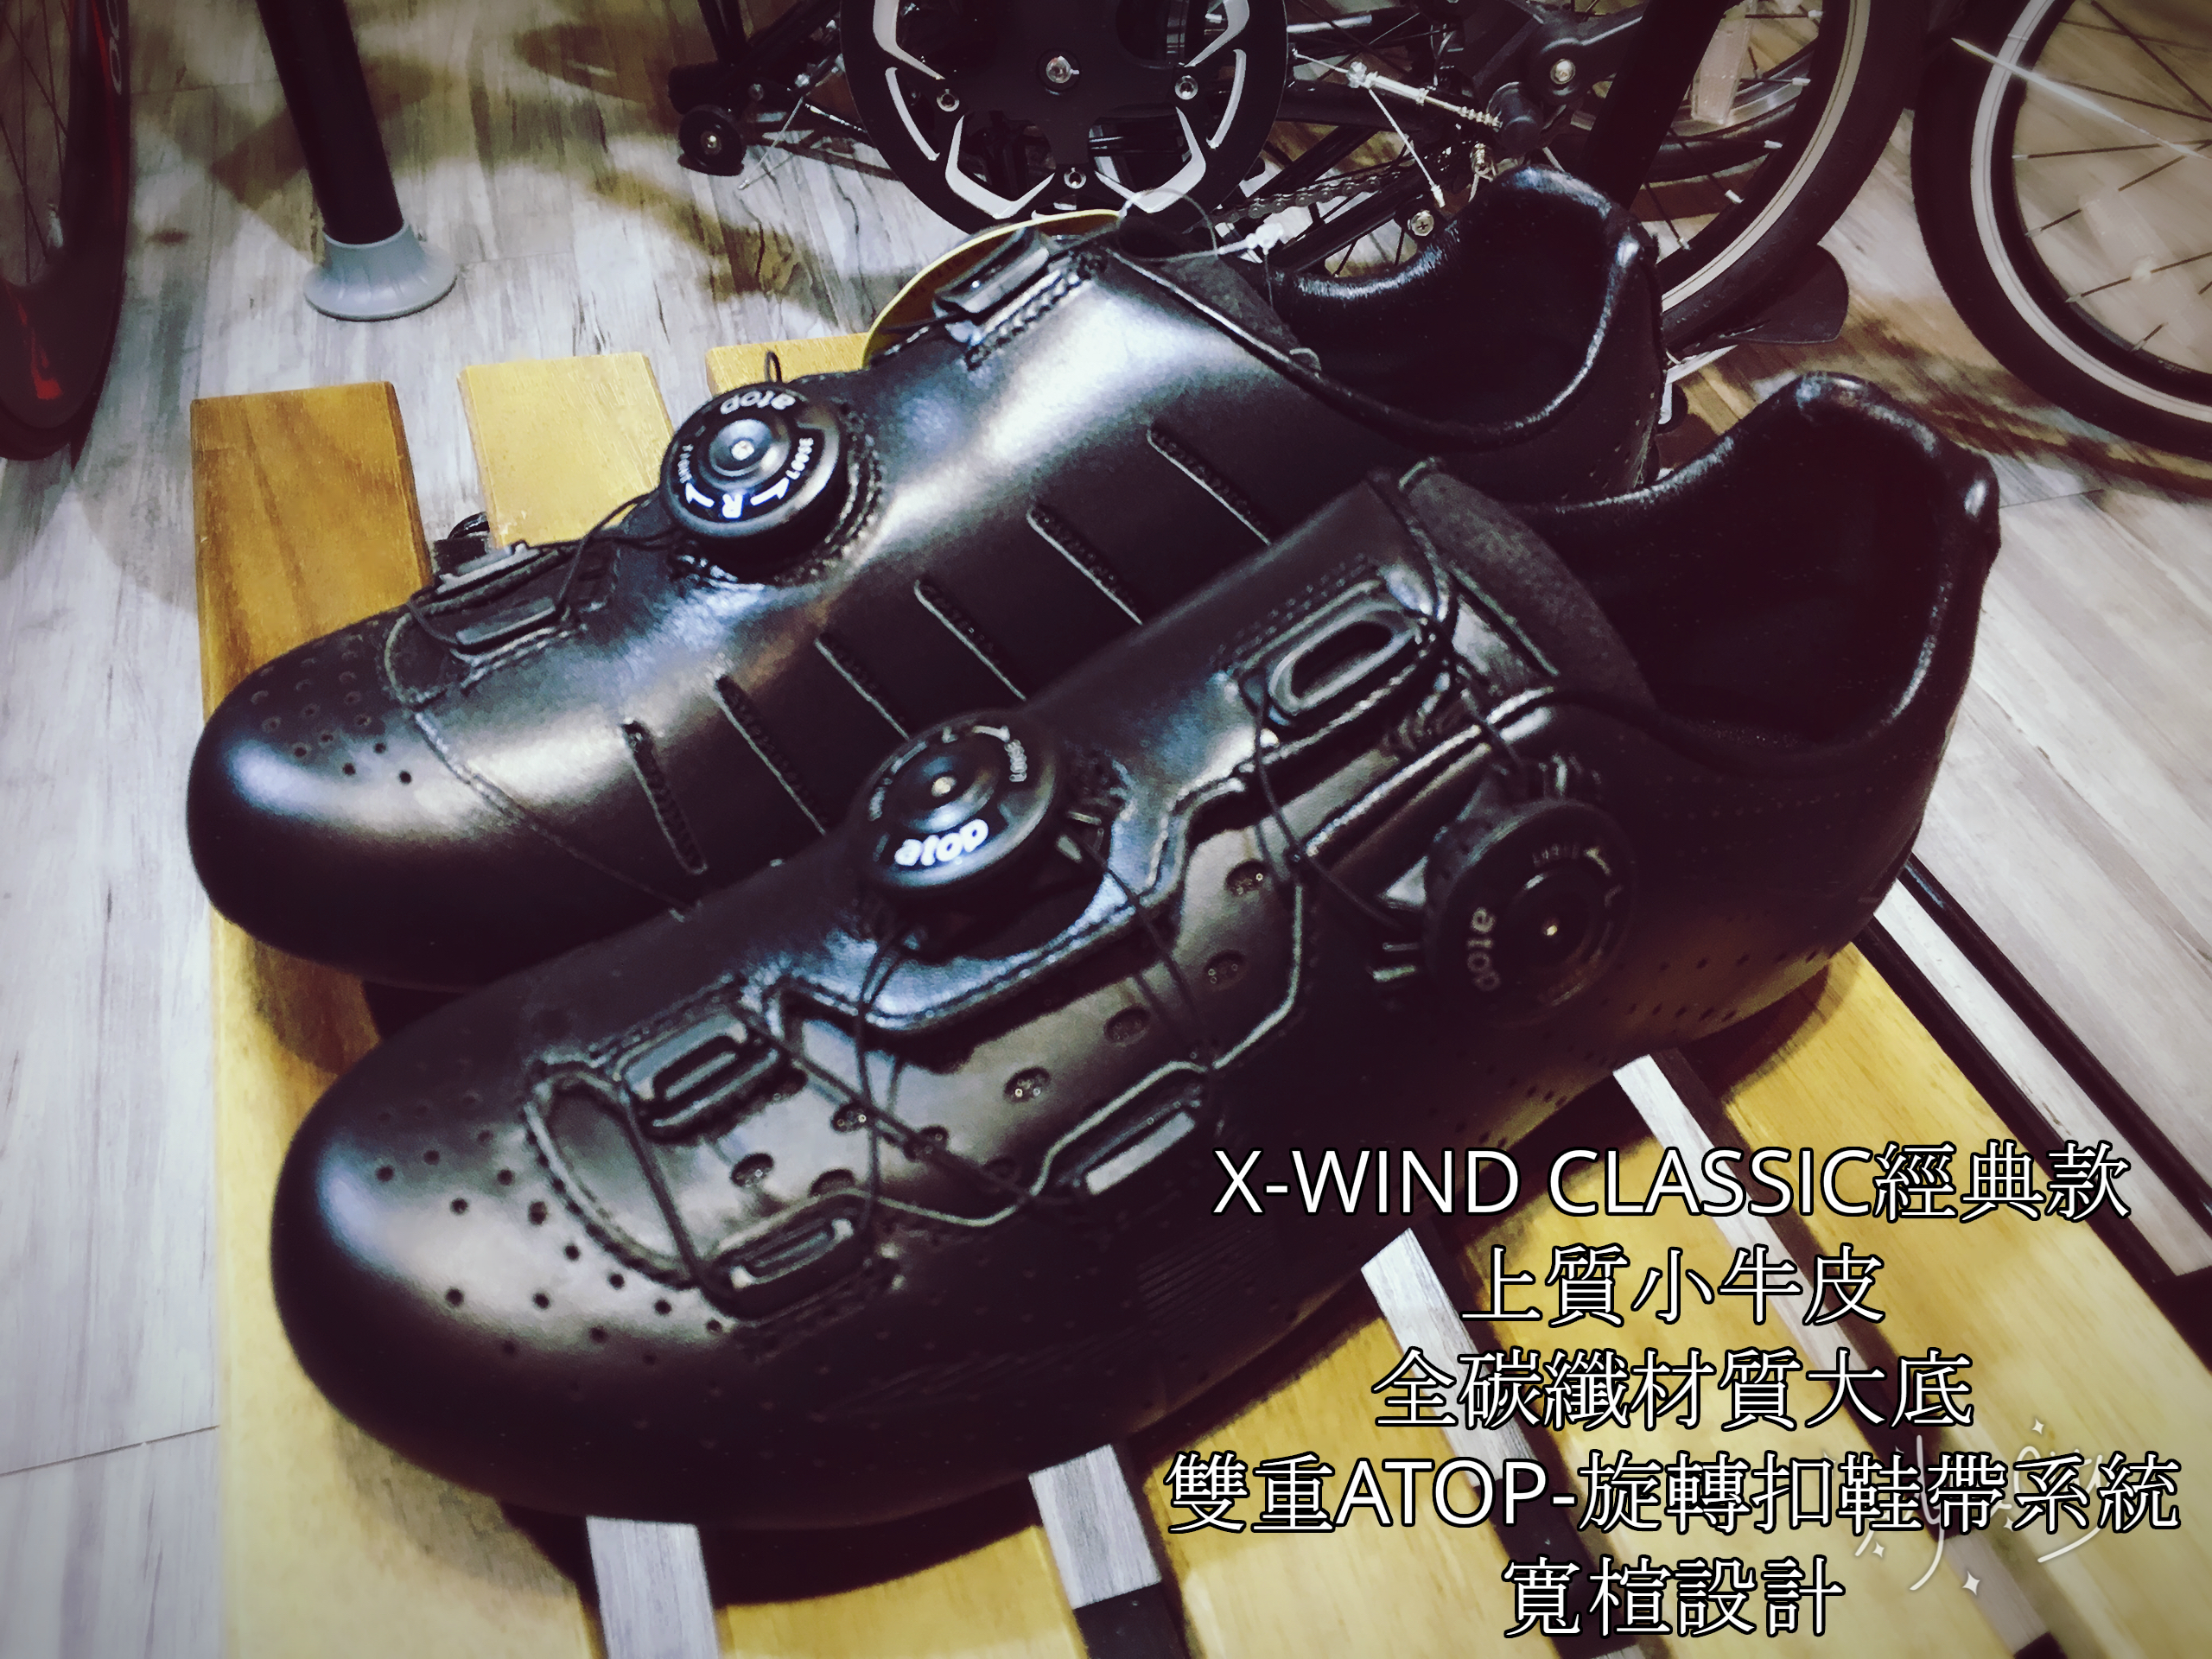 X-WIND CLASSIC 皮製經典款公路車卡鞋(寬楦 大腳專用)